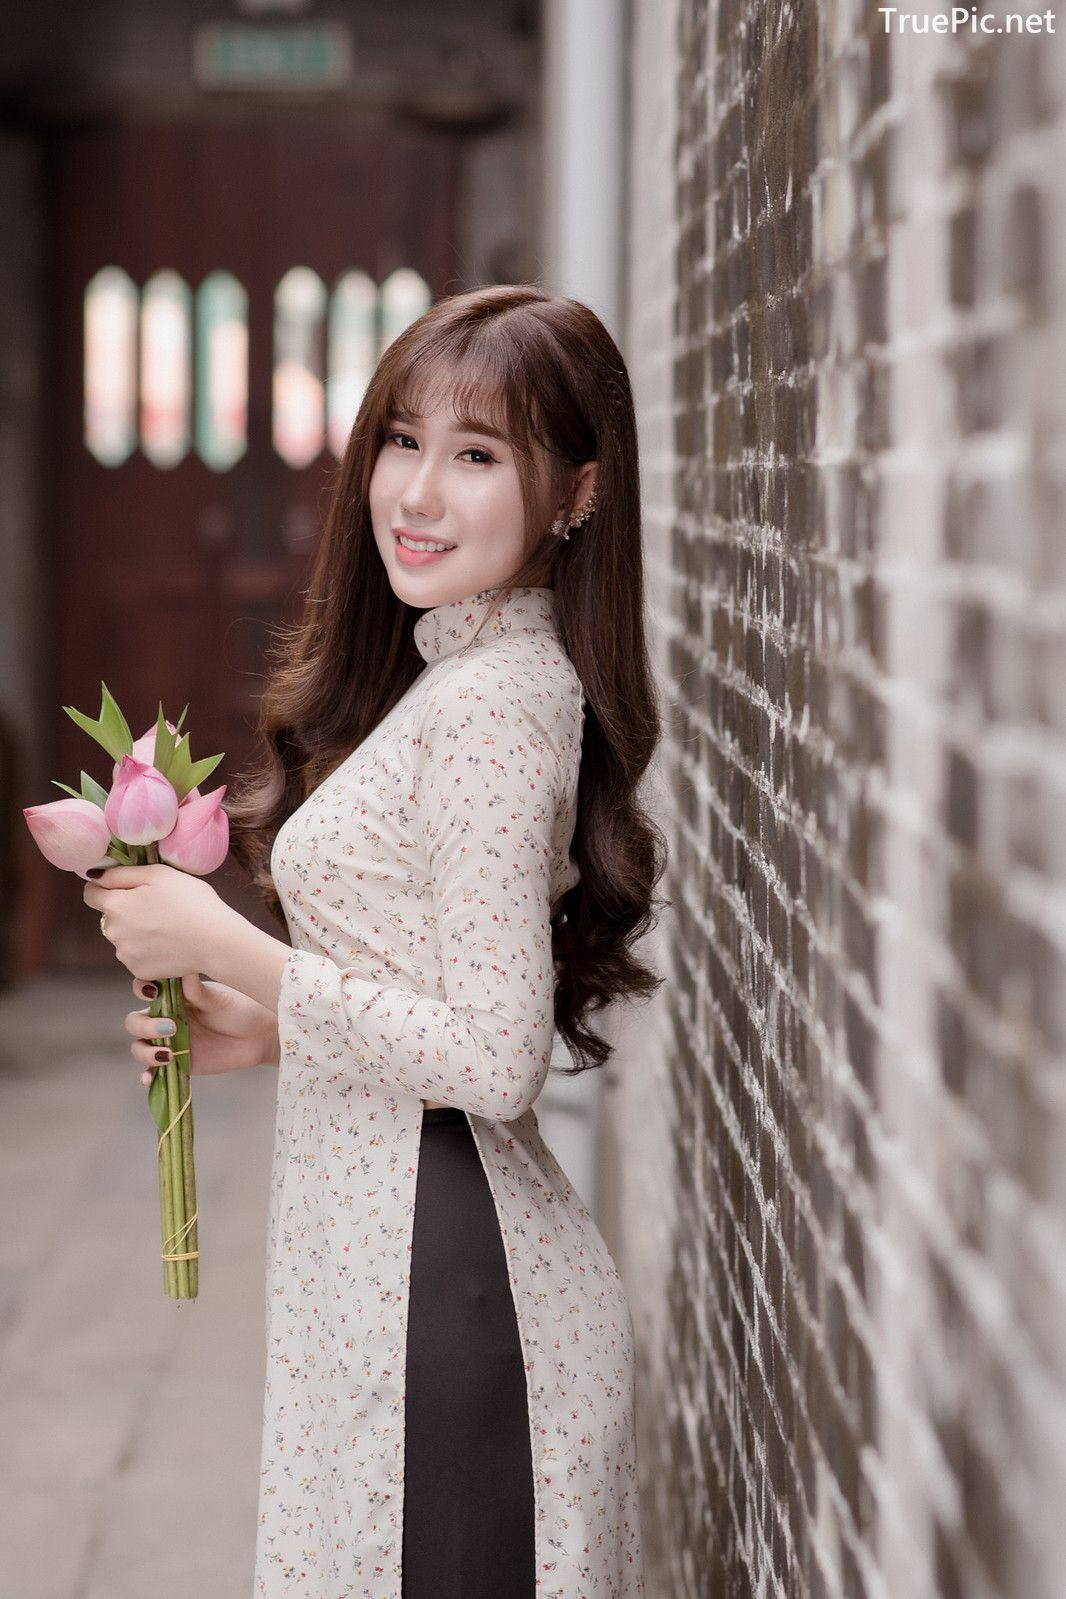 Image-Vietnamese-Beautiful-Girl-Ao-Dai-Vietnam-Traditional-Dress-by-VIN-Photo-2-TruePic.net- Picture-6